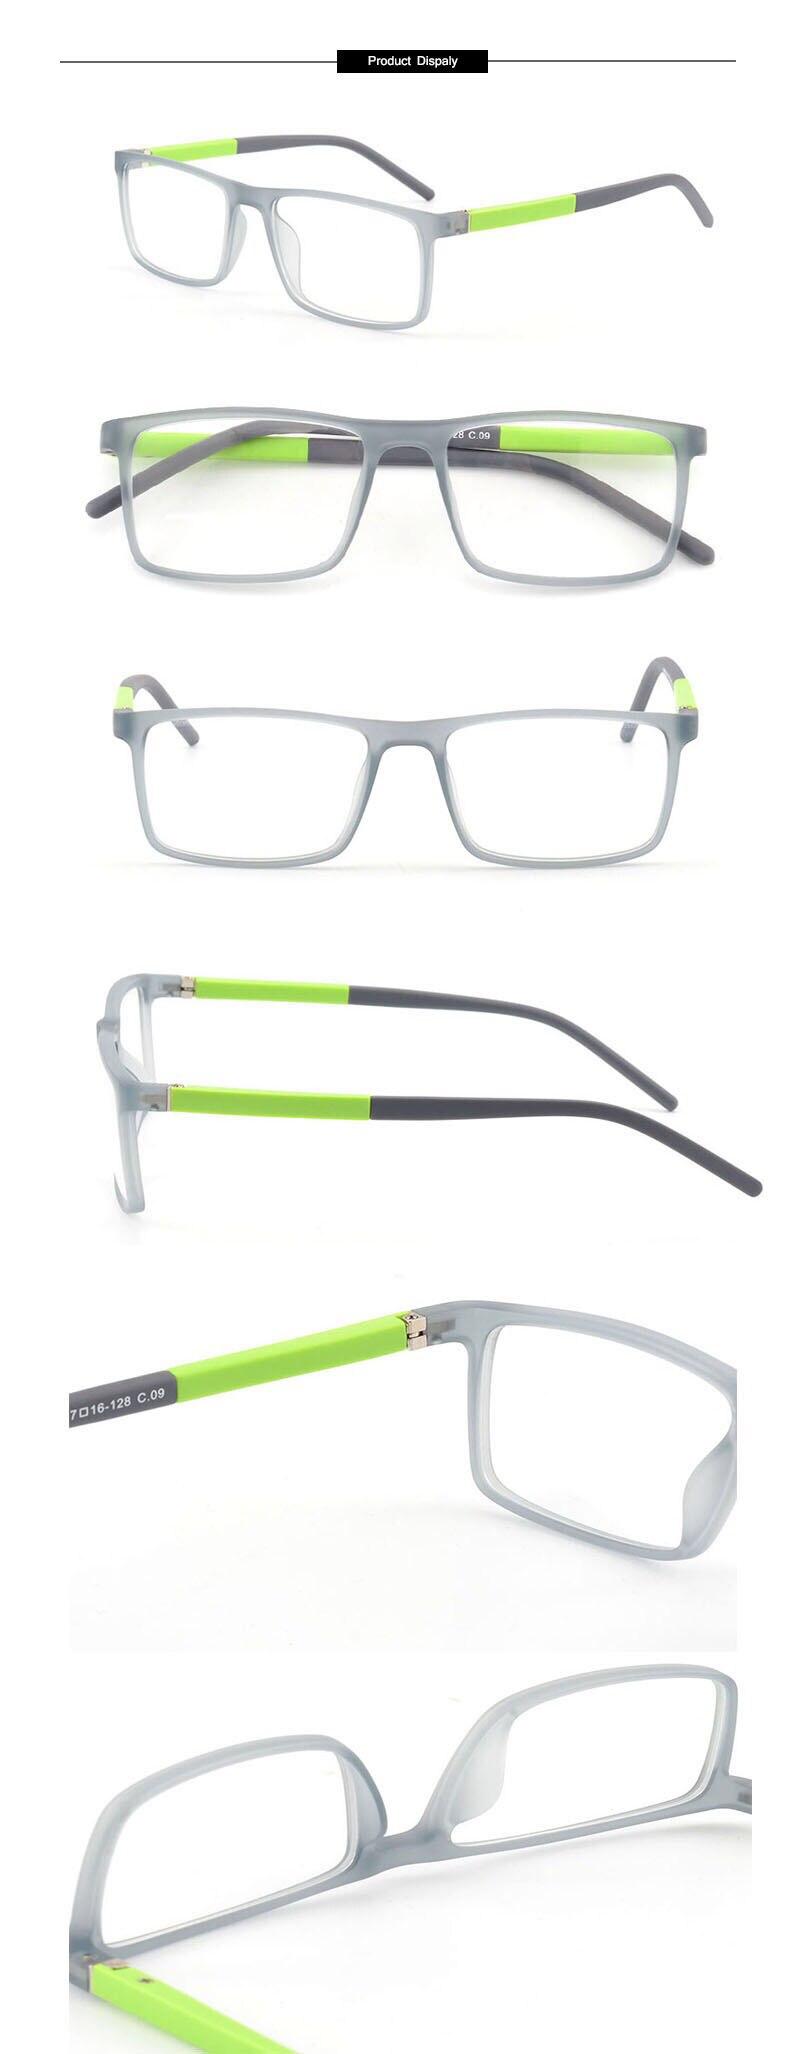 Kids Prescription Glasses Tr90 Children Eyeglasses Flexible Eyewear Myopia Reading Astigmatism Eyeglasses Photochromic Glasses (4)